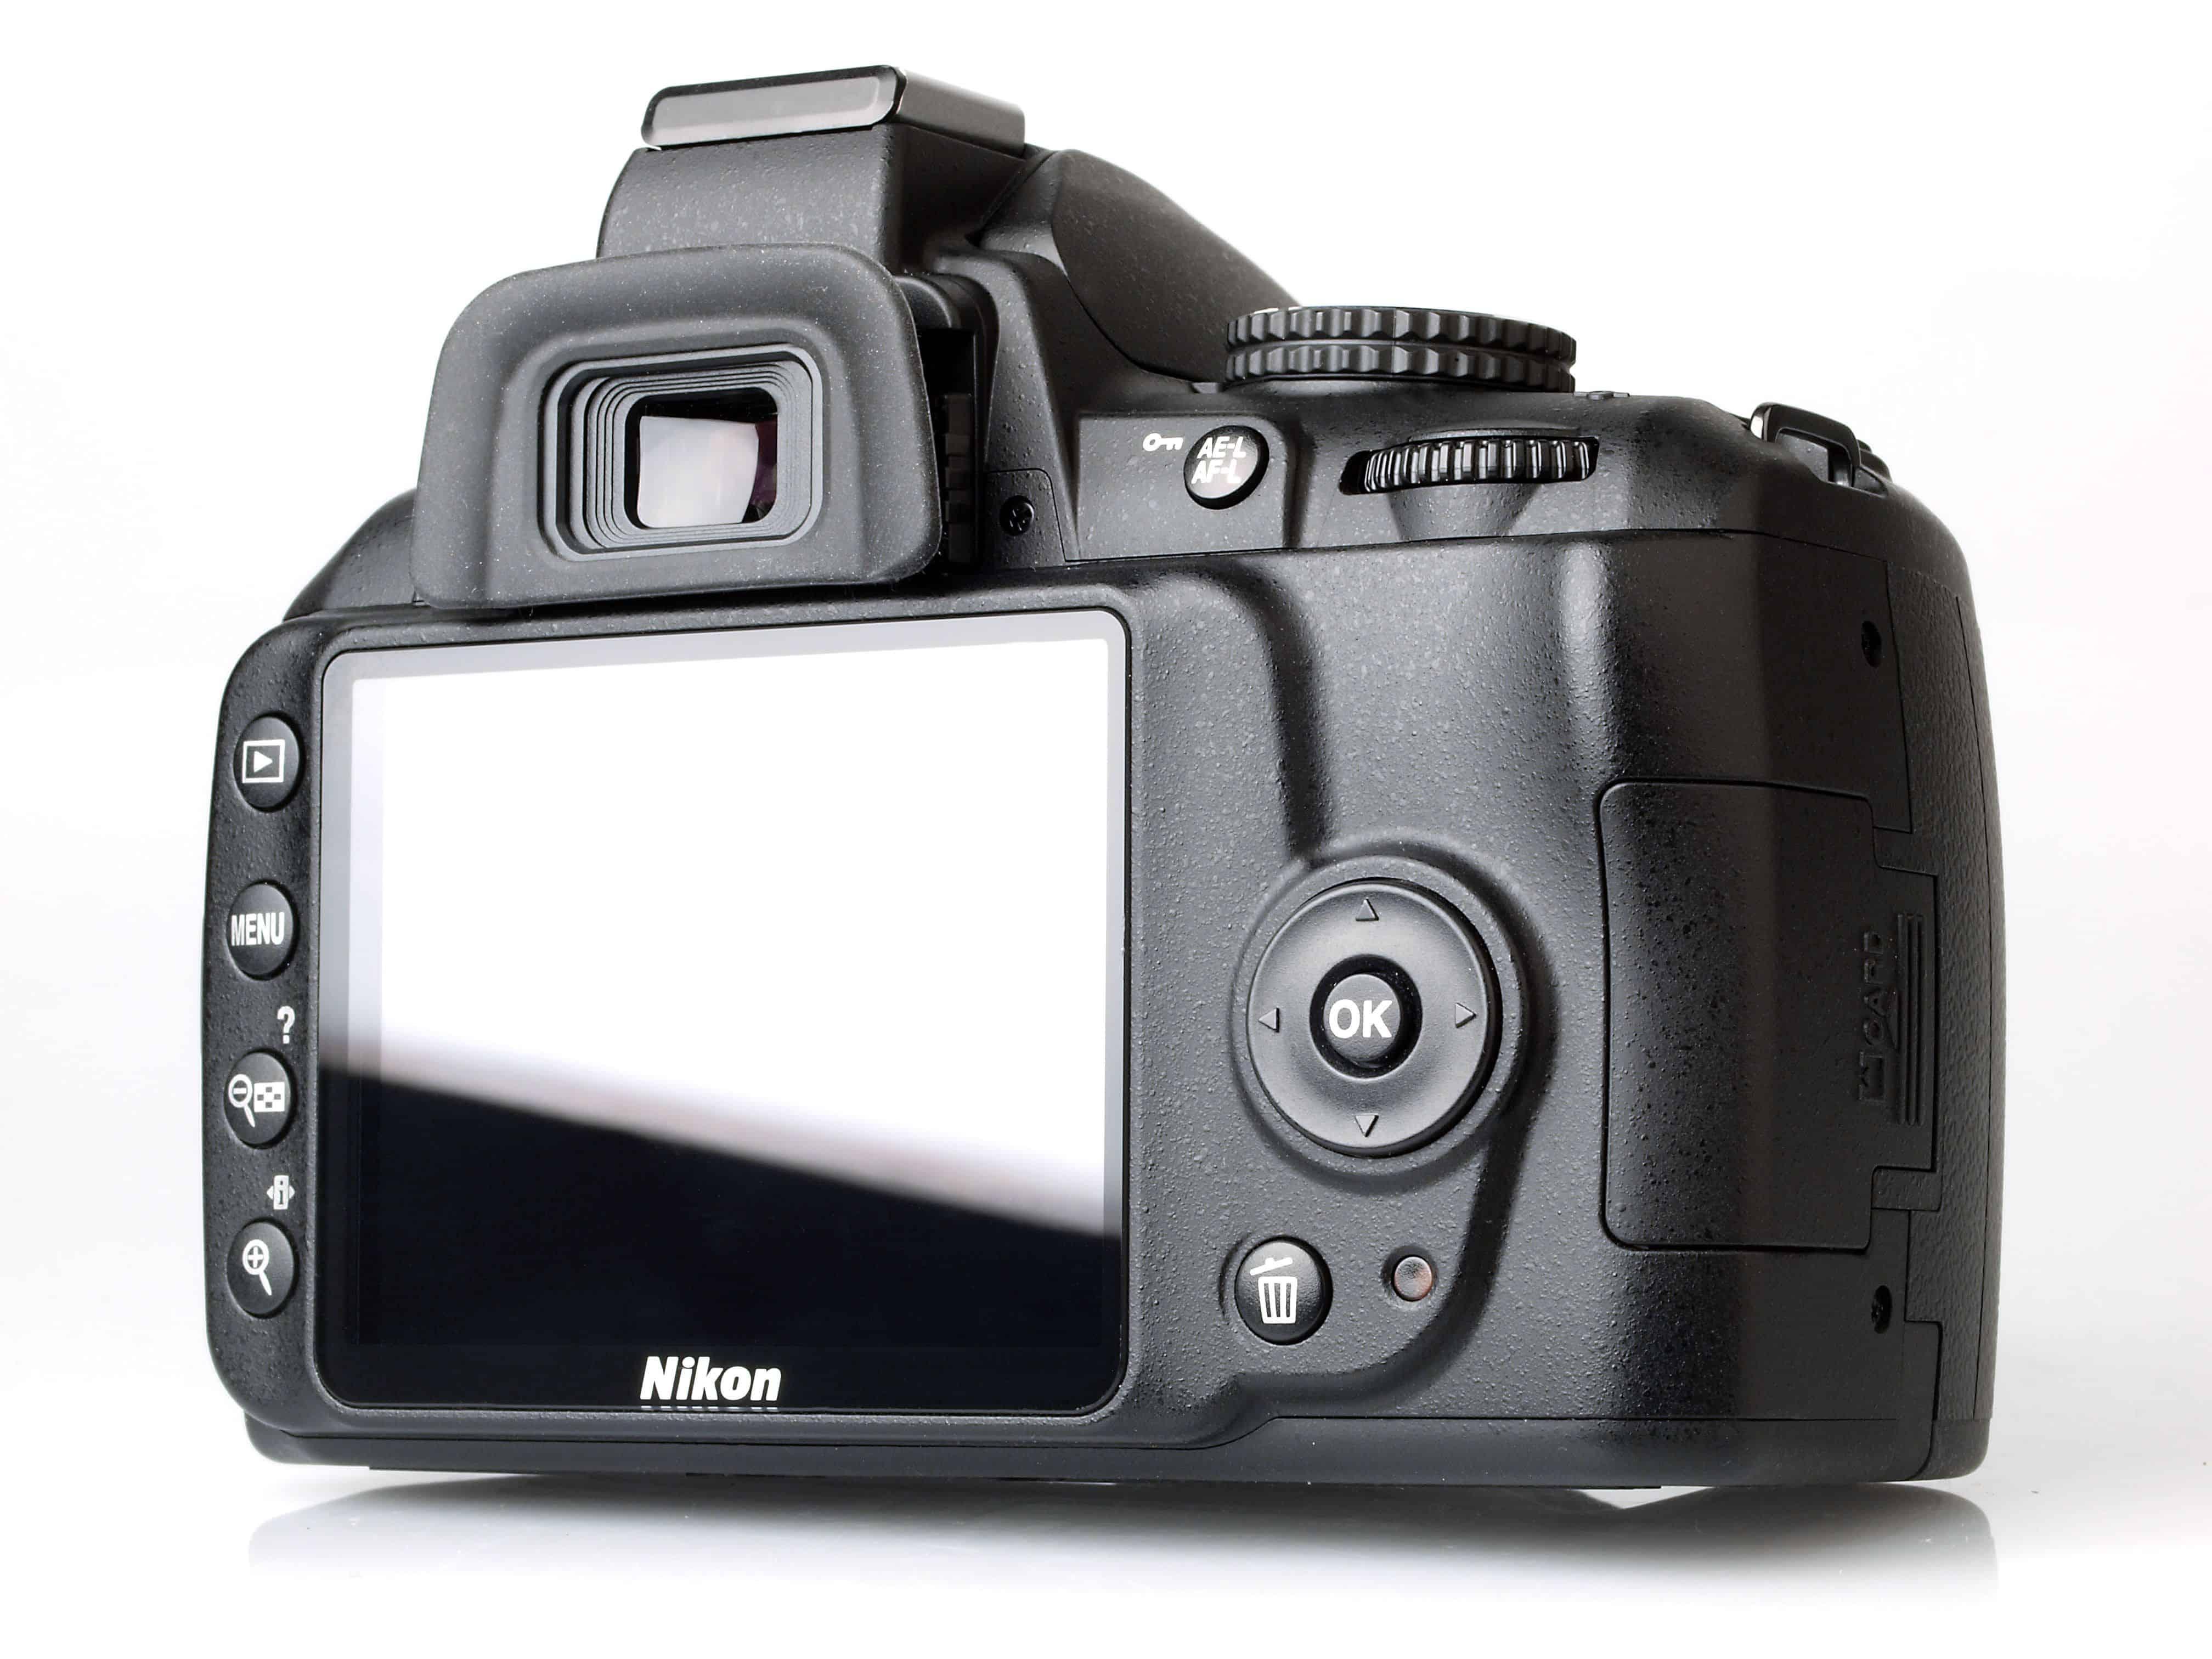 Nikon capture nx 2 good price